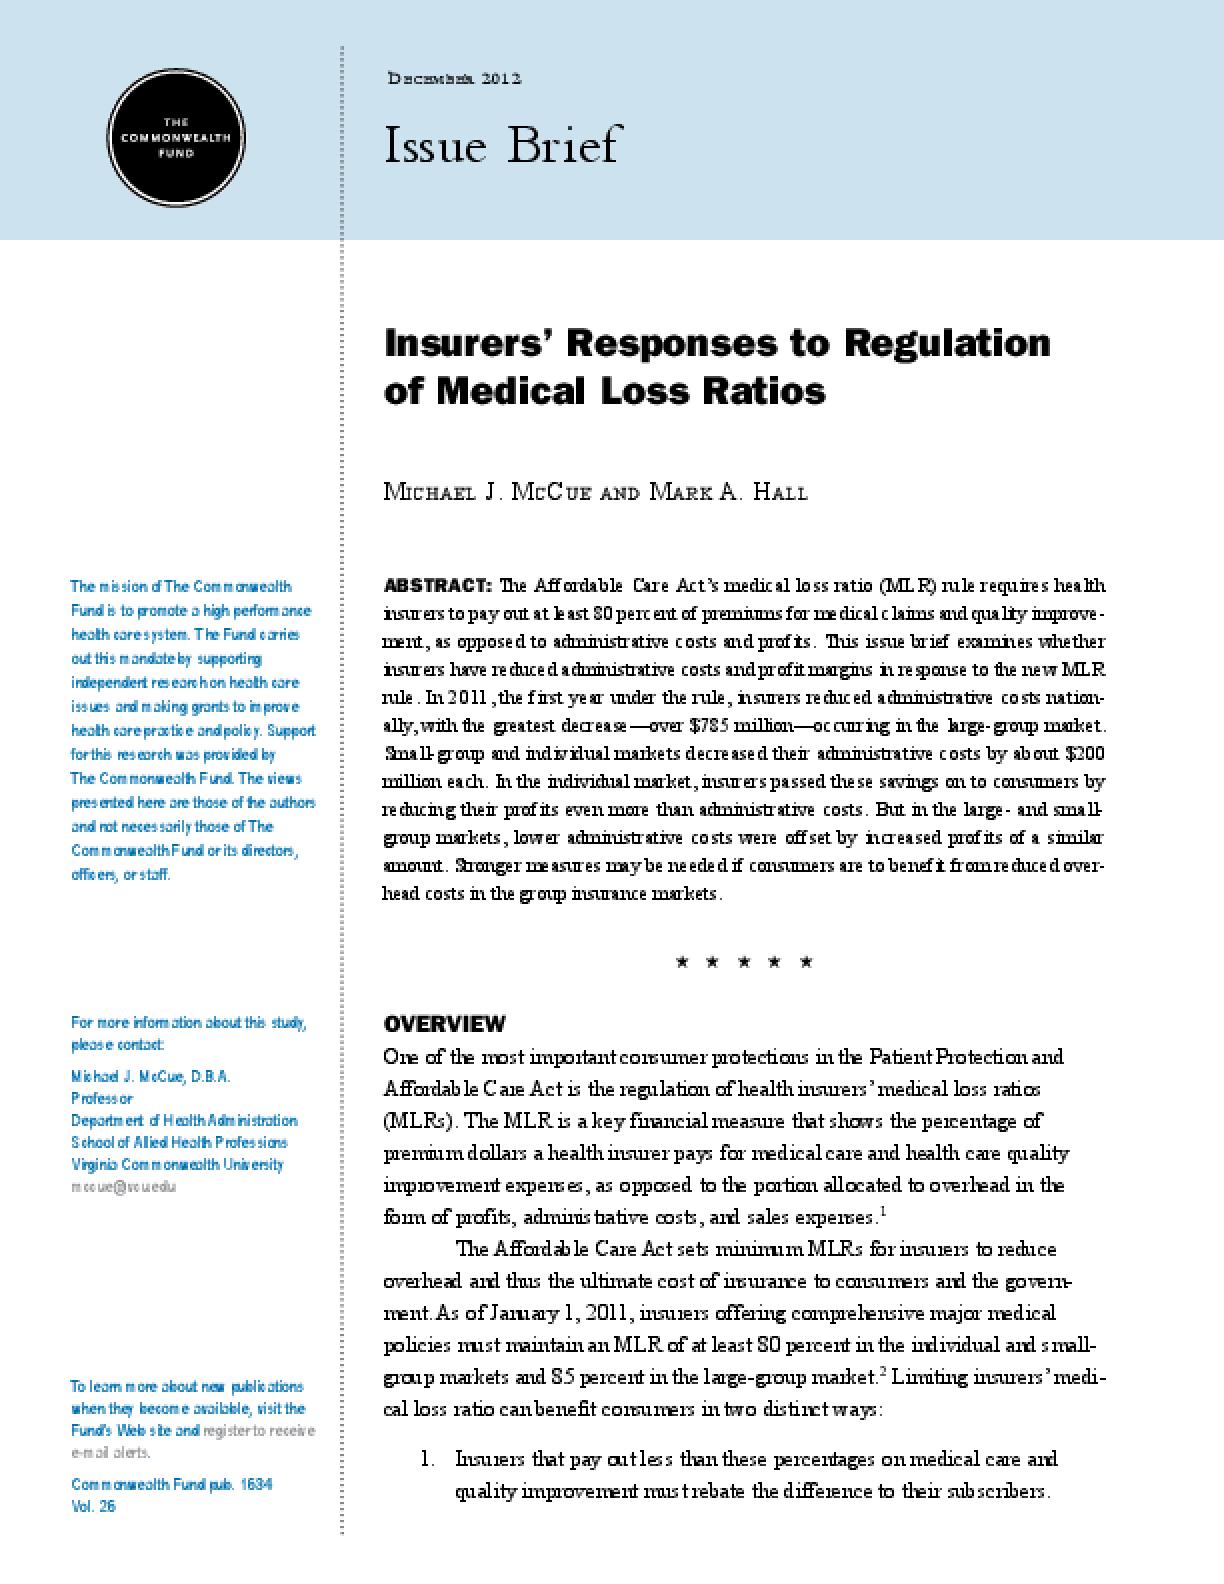 Insurers' Responses to Regulation of Medical Loss Ratios